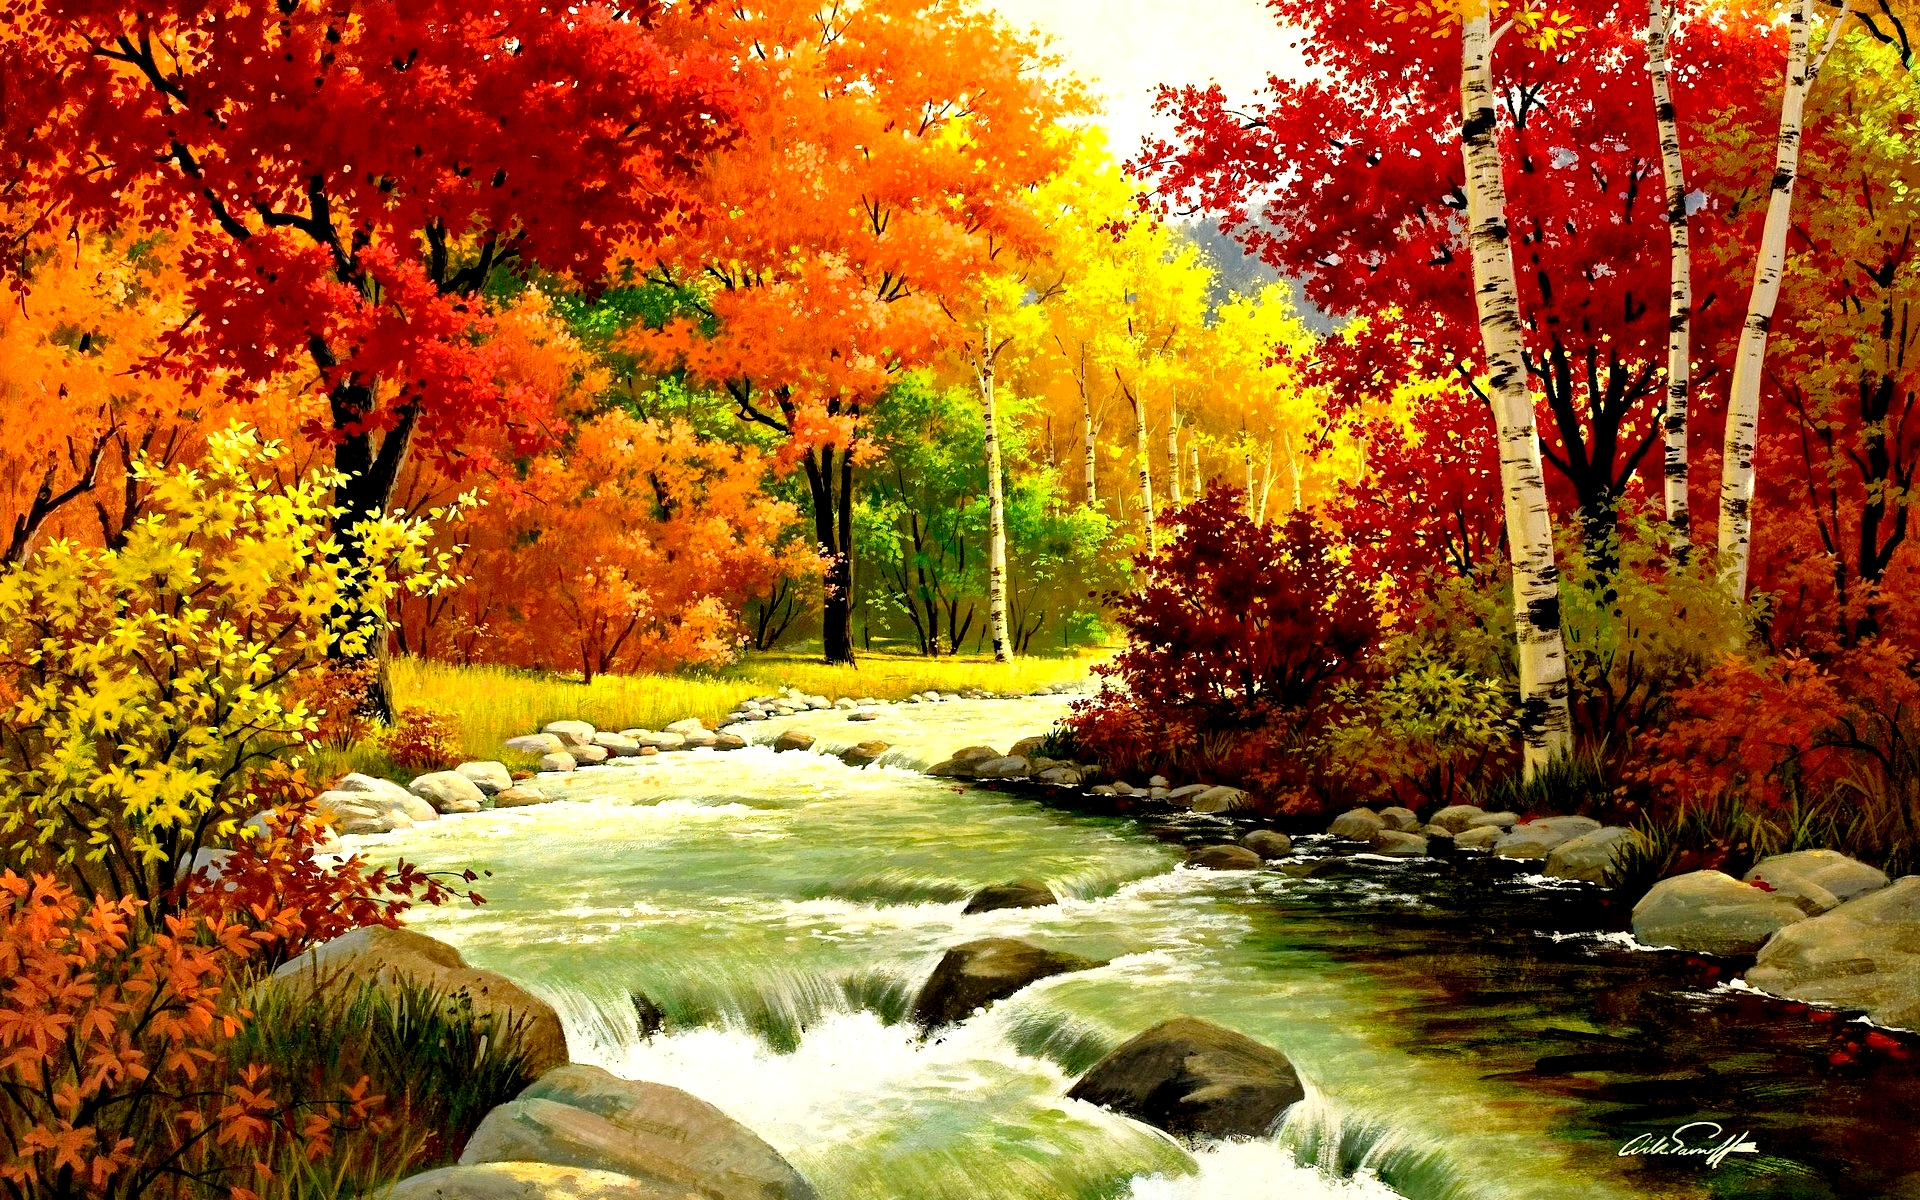 Autumn Fall Wallpapers River 2621 Wallpaper Cool Walldiskpapercom 1920x1200